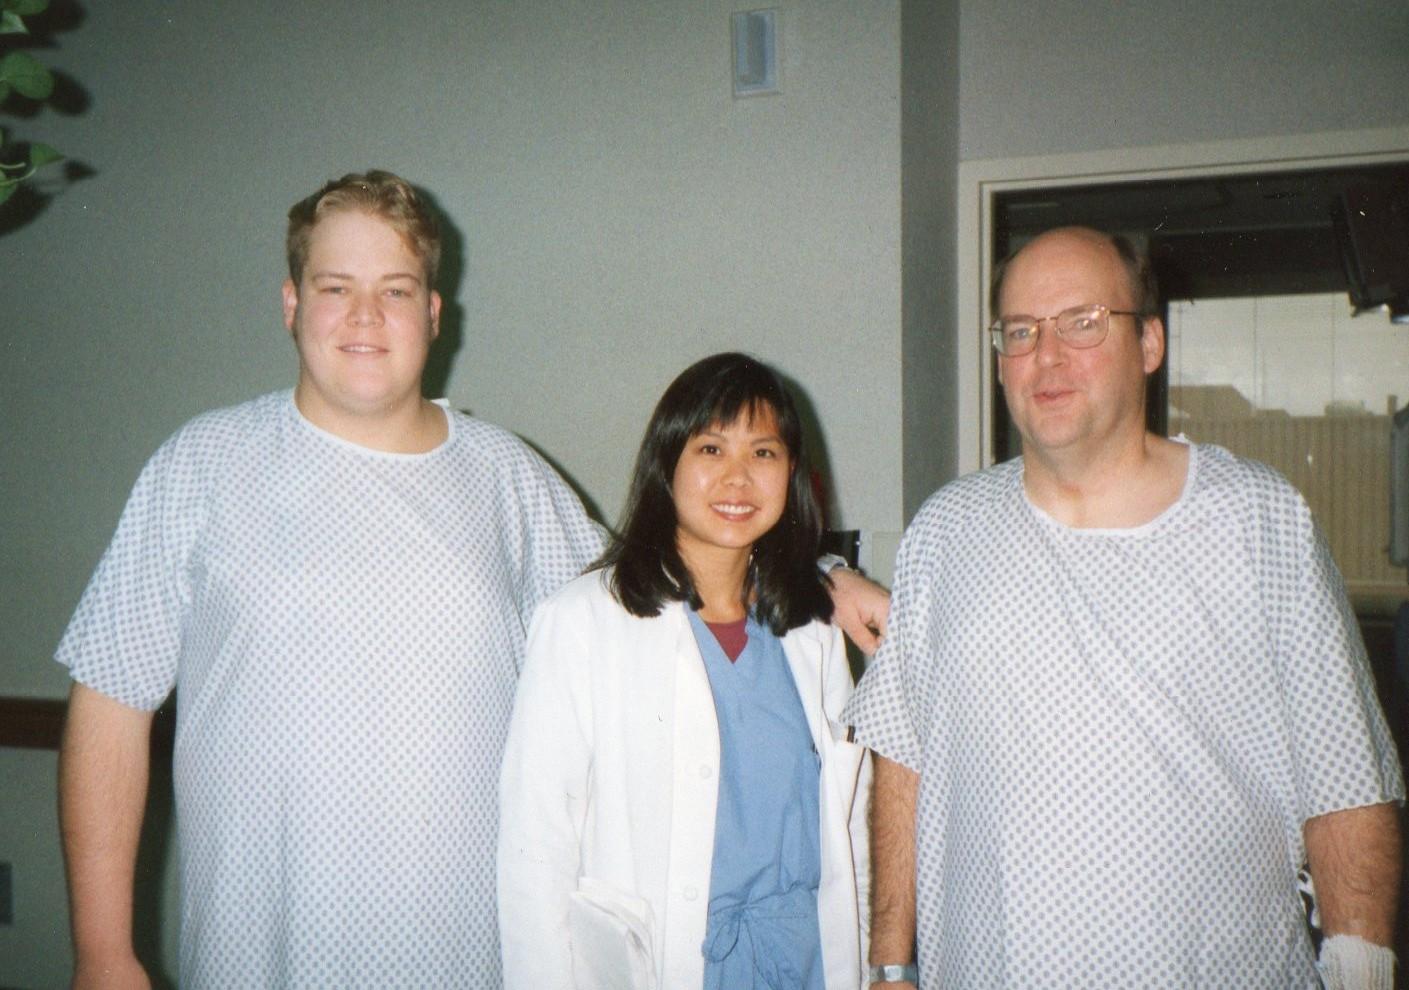 Transplant photos